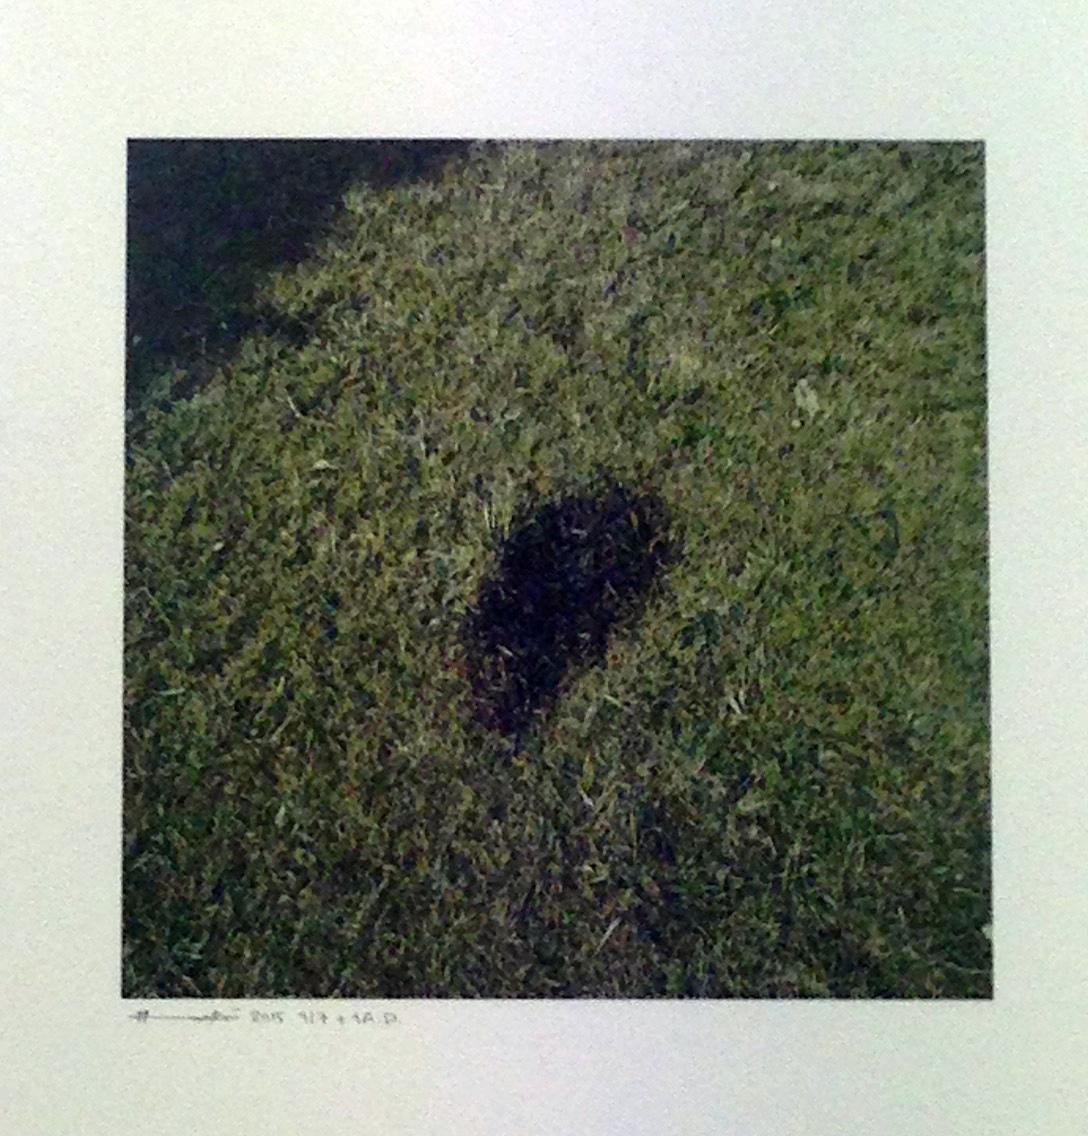 30 X 30 CM in 7 Edition + 1 A.P Digital Print on  Velvet Photo Paper